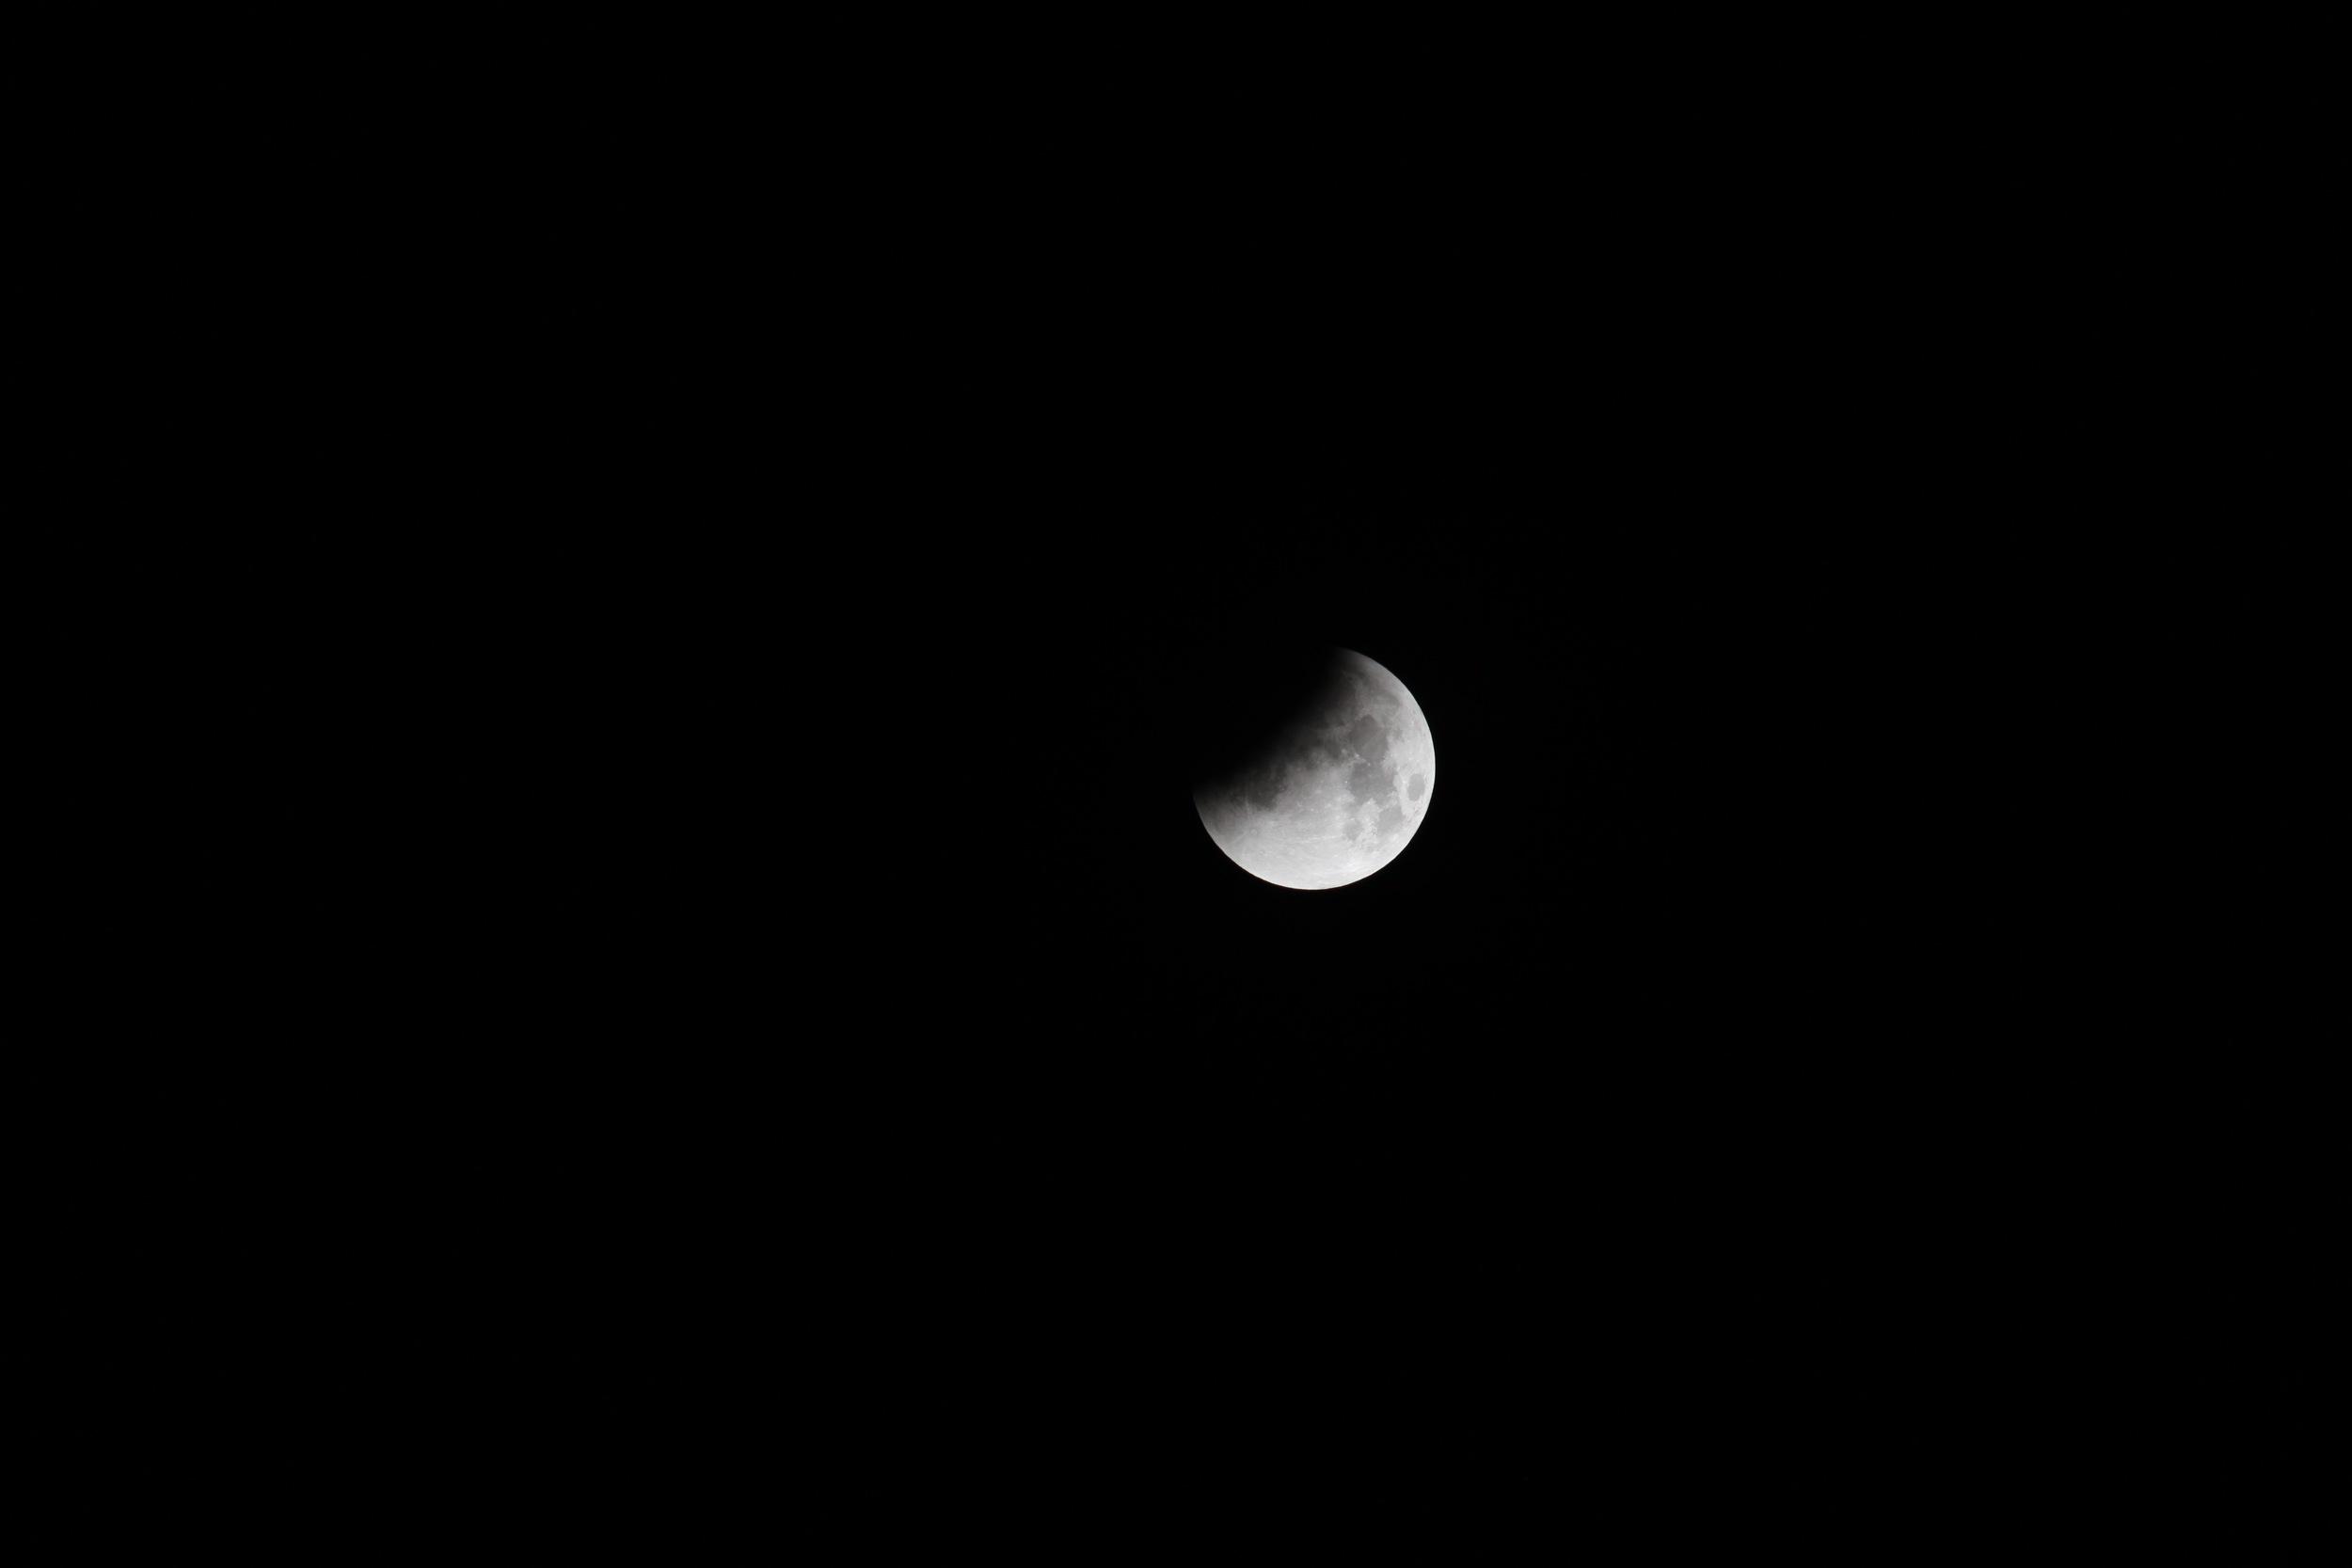 supermoon eclipse emma leafe 2015.jpg